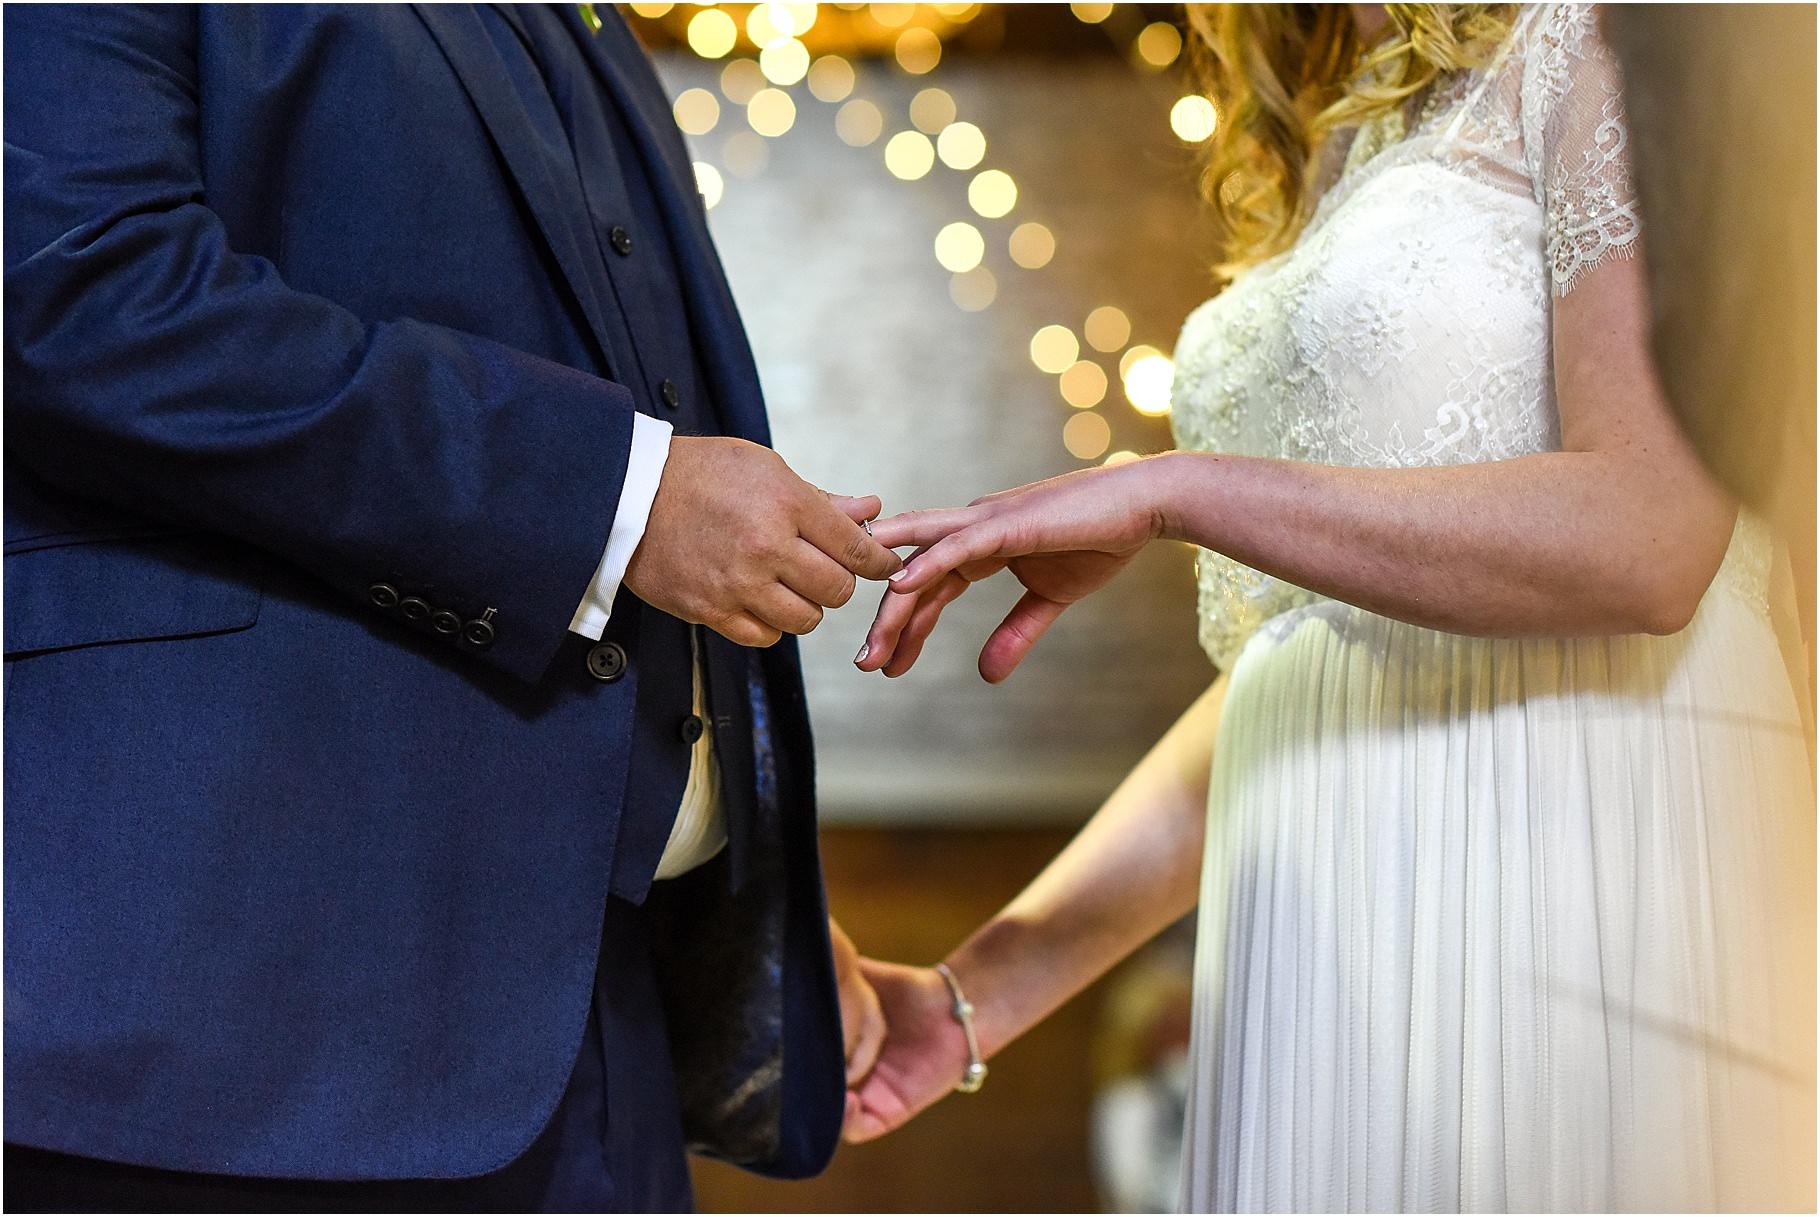 dan-wootton-photography-2017-weddings-196.jpg